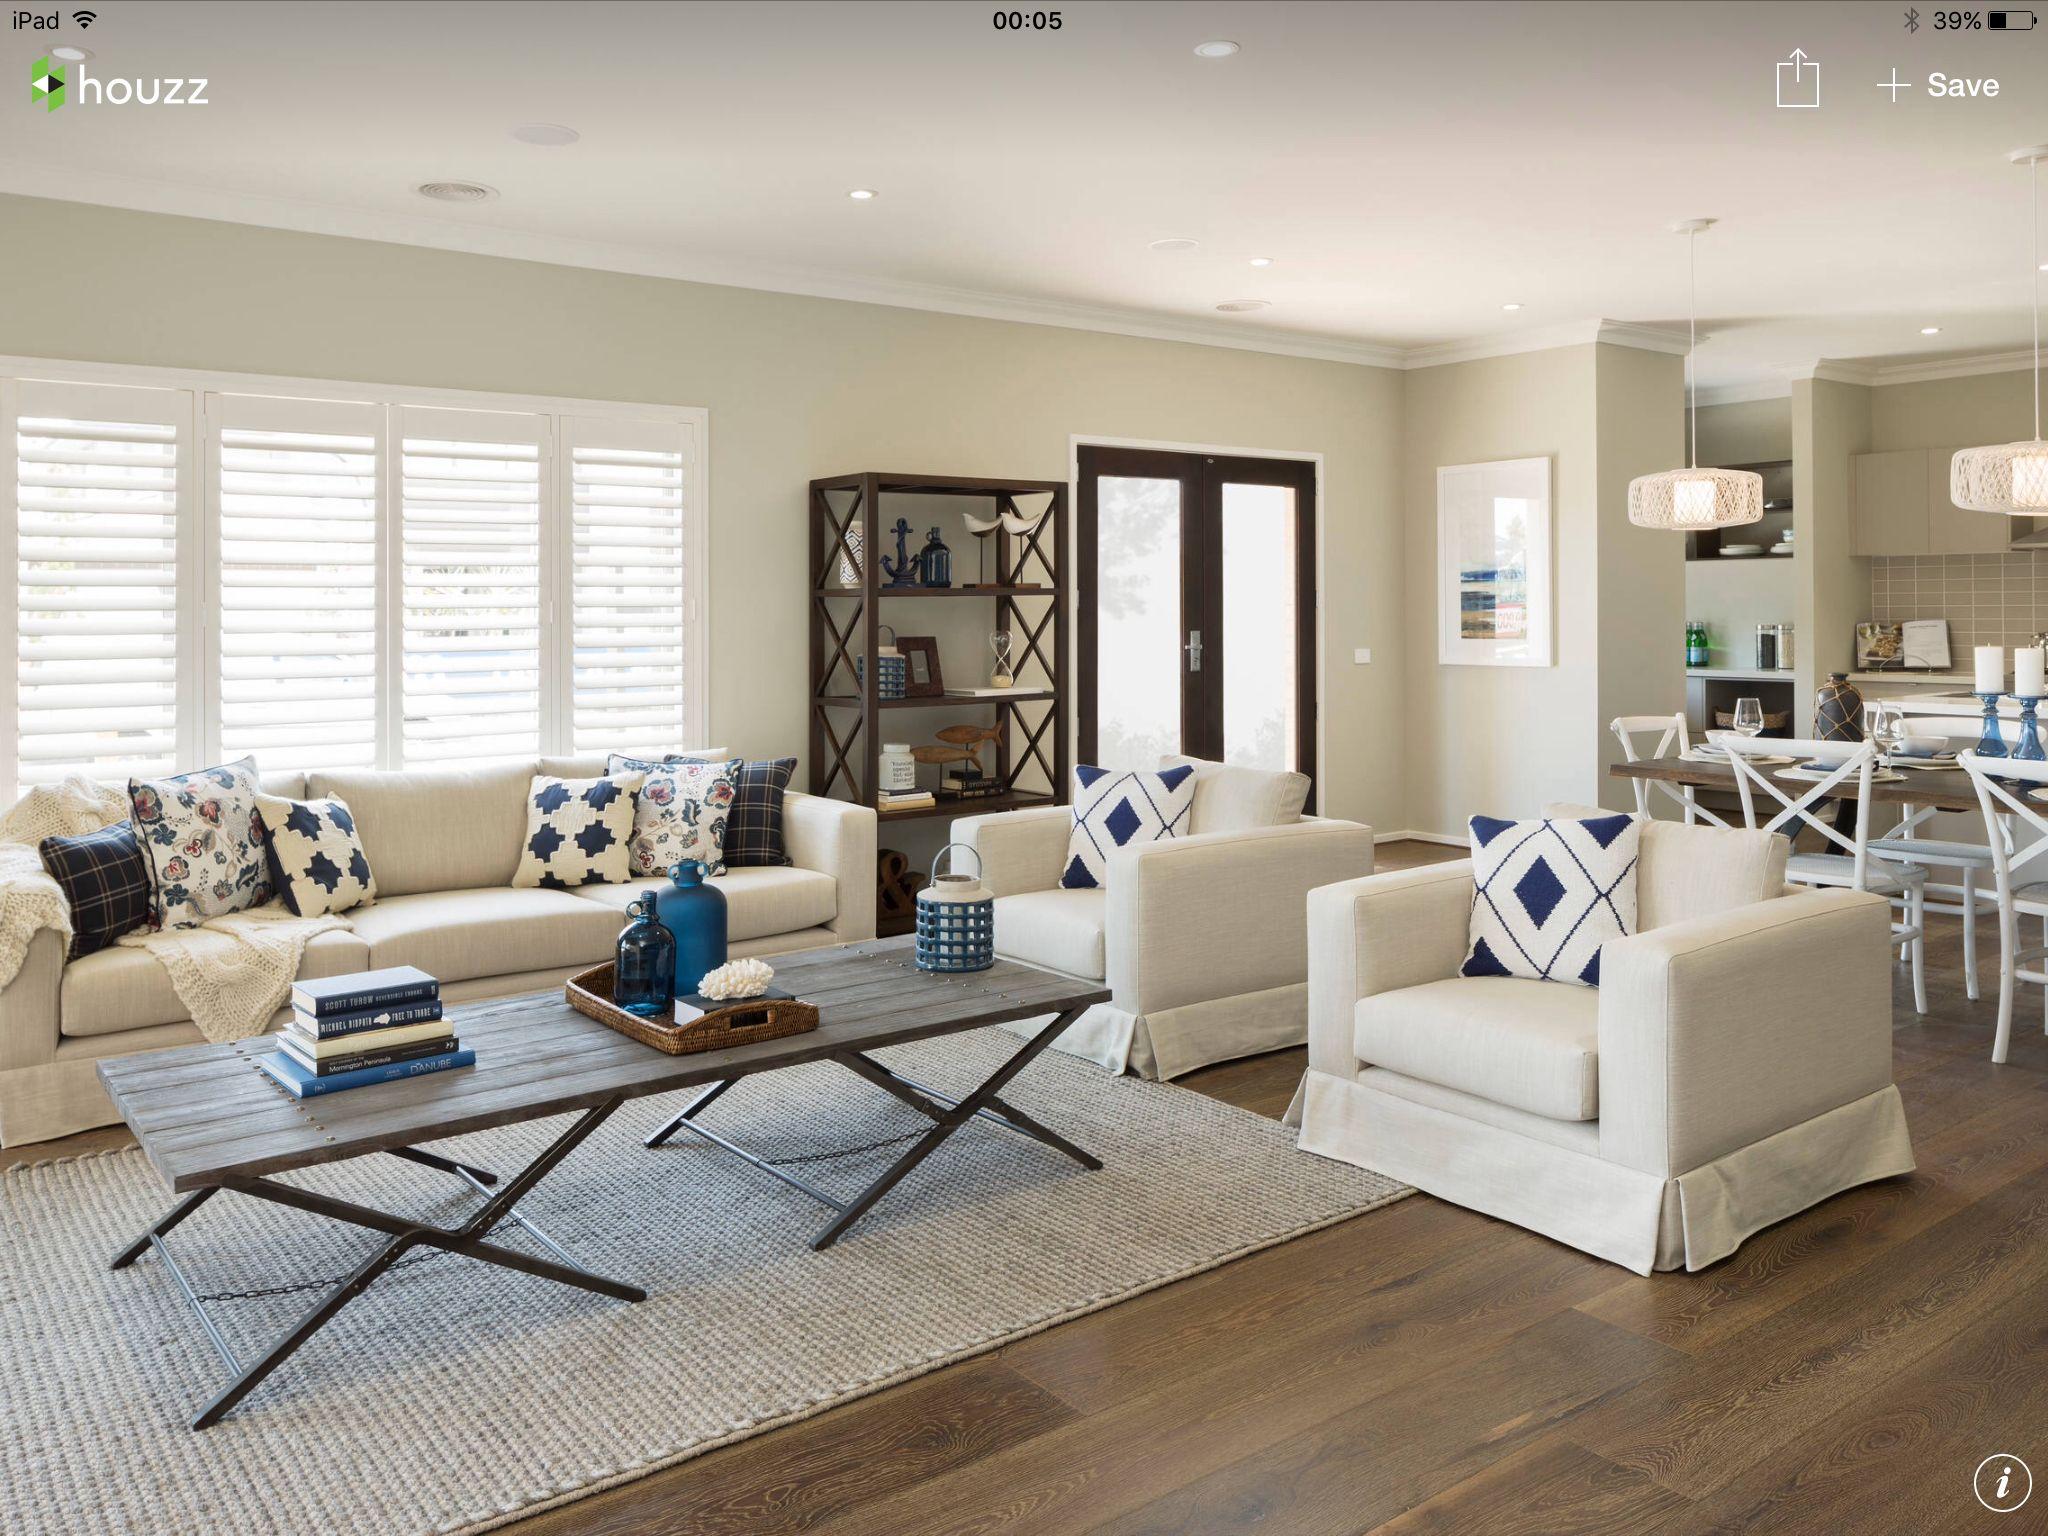 Living room inspiration from houzz | home | Pinterest | Living room ...